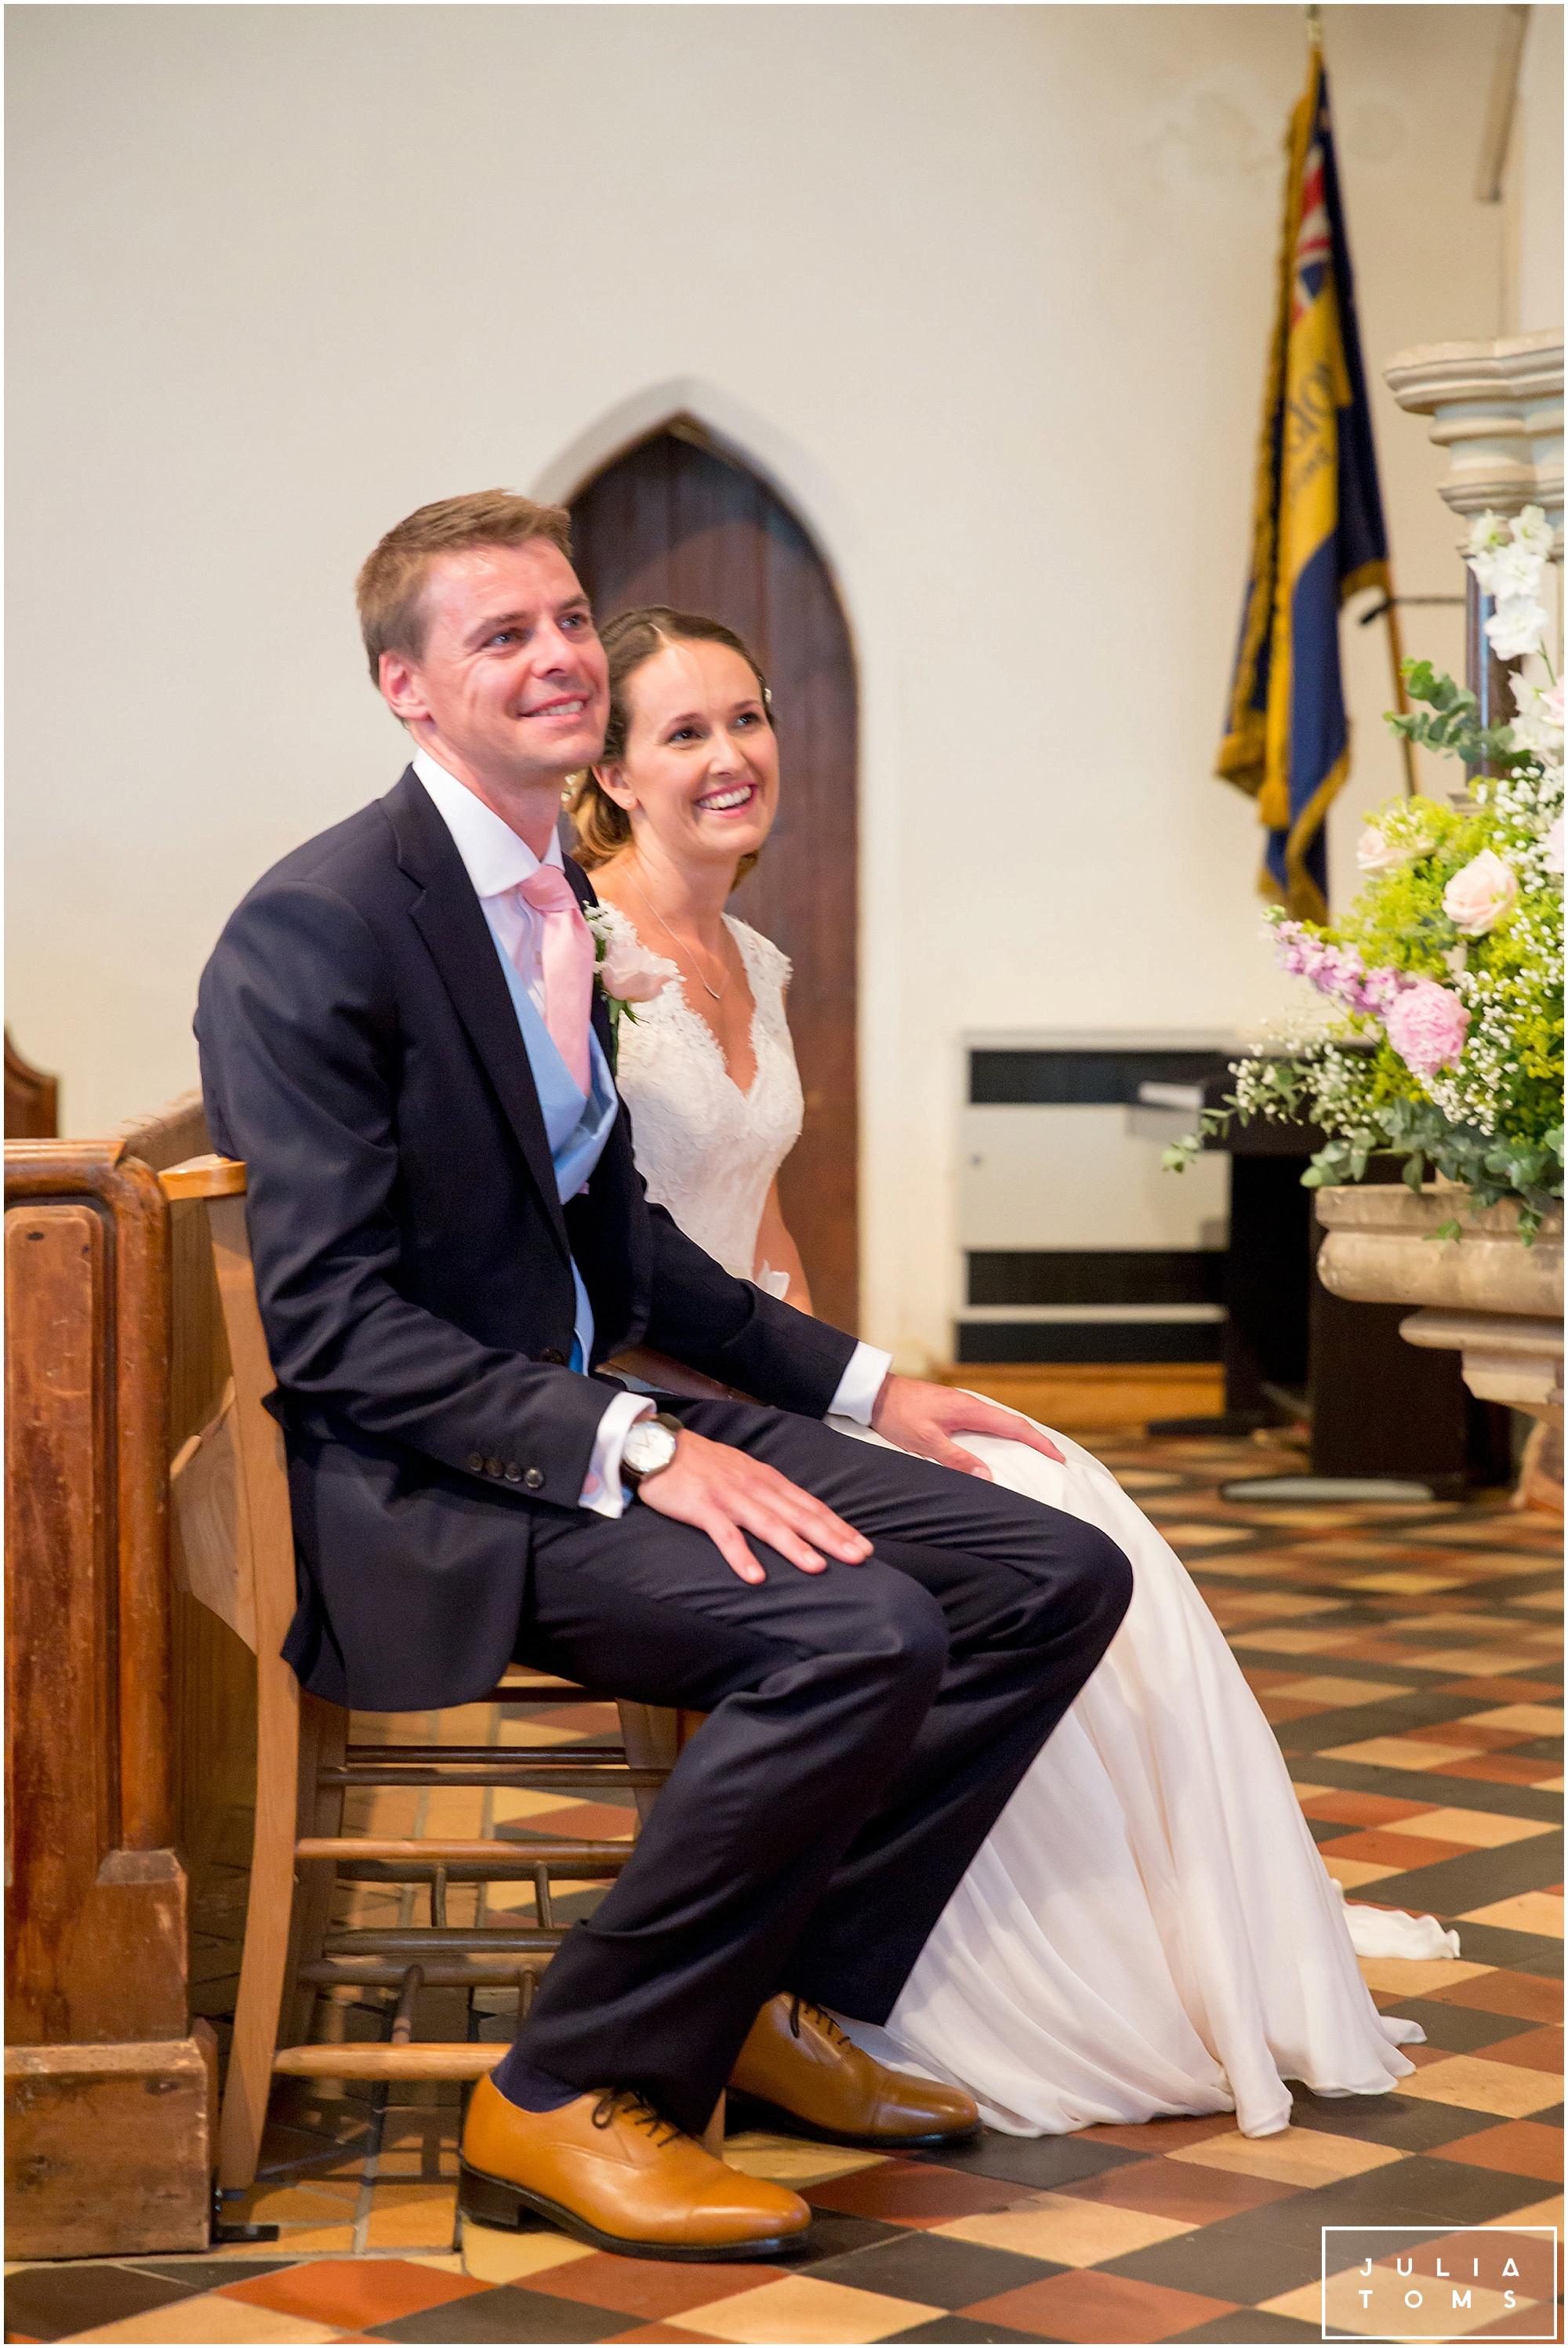 julia_toms_chichester_wedding_photographer_portsmouth_024.jpg